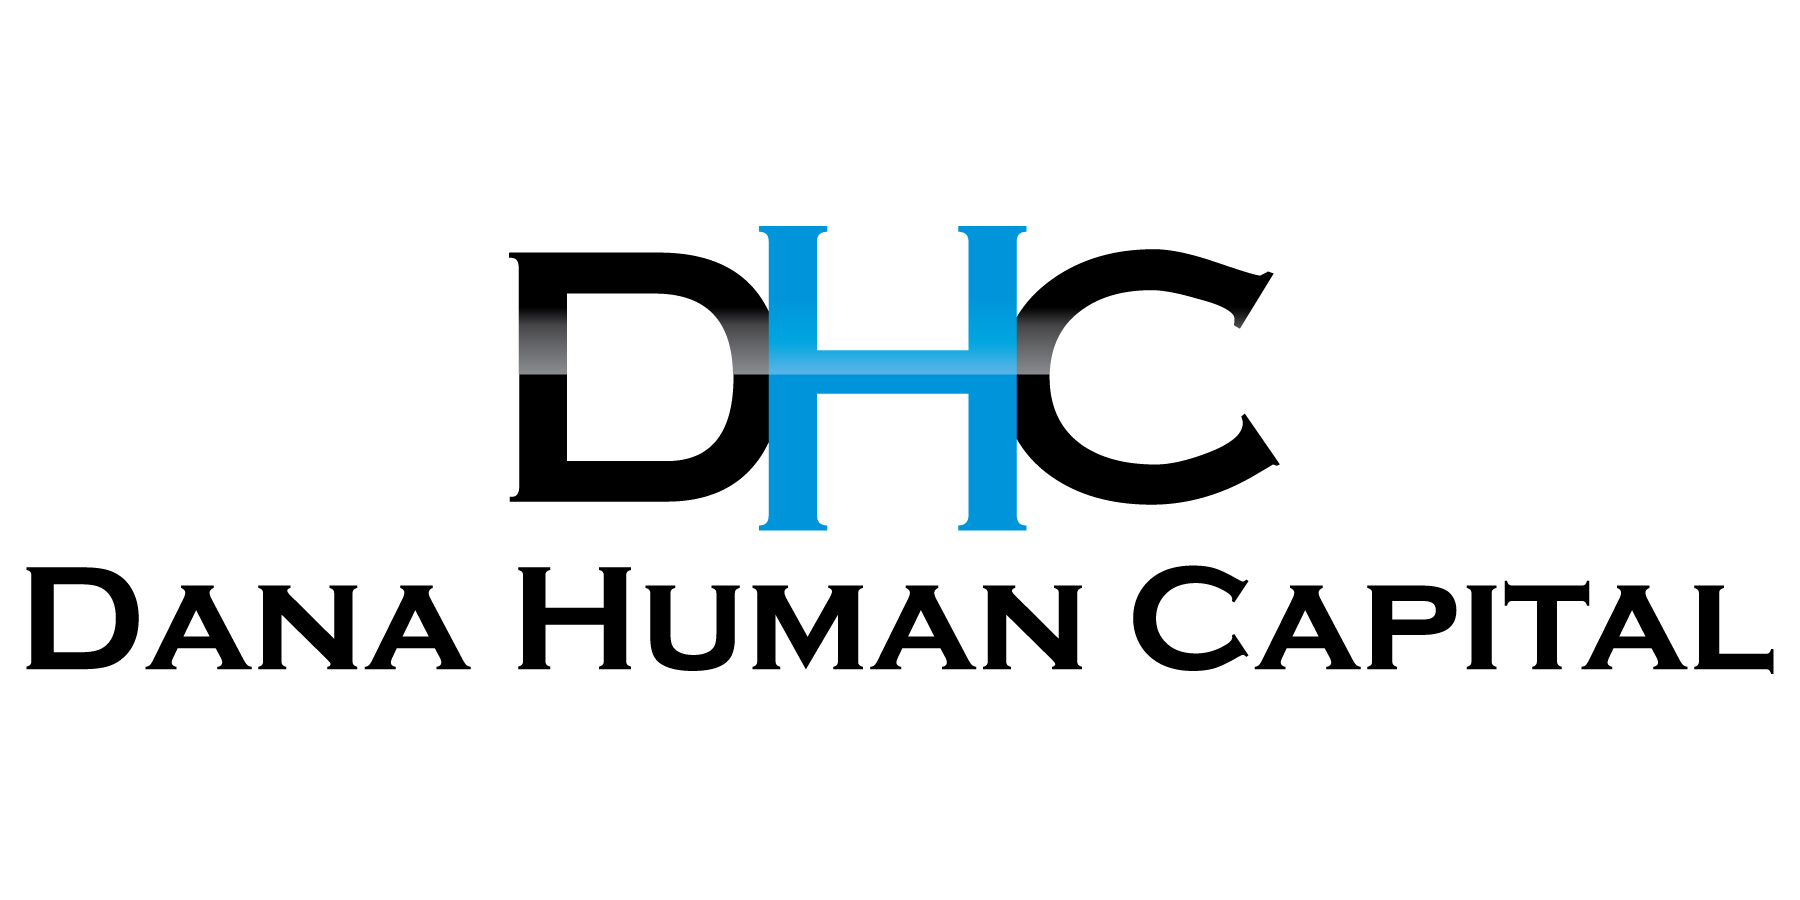 DANA HUMAN CAPITAL